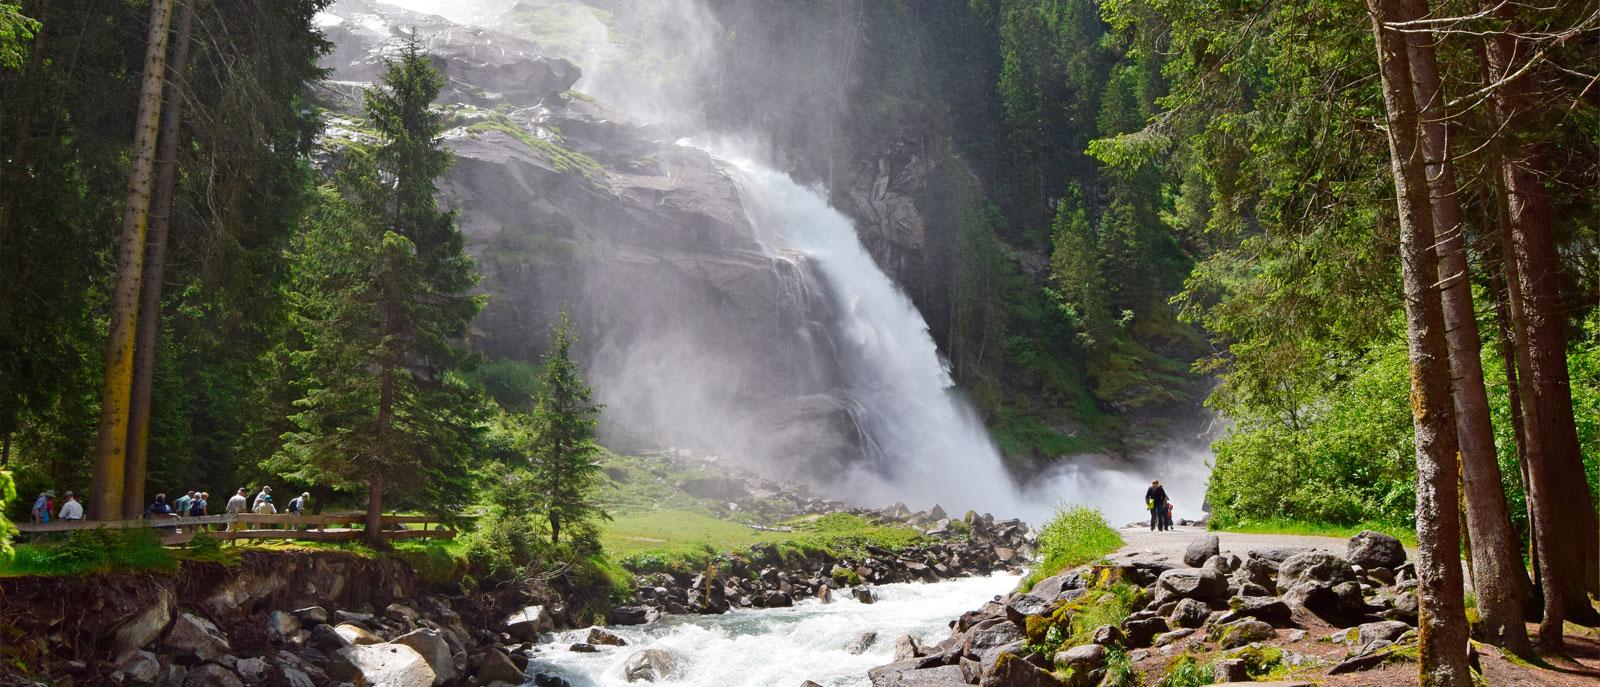 Krimml Waterfalls Hohe Tauern National Parc